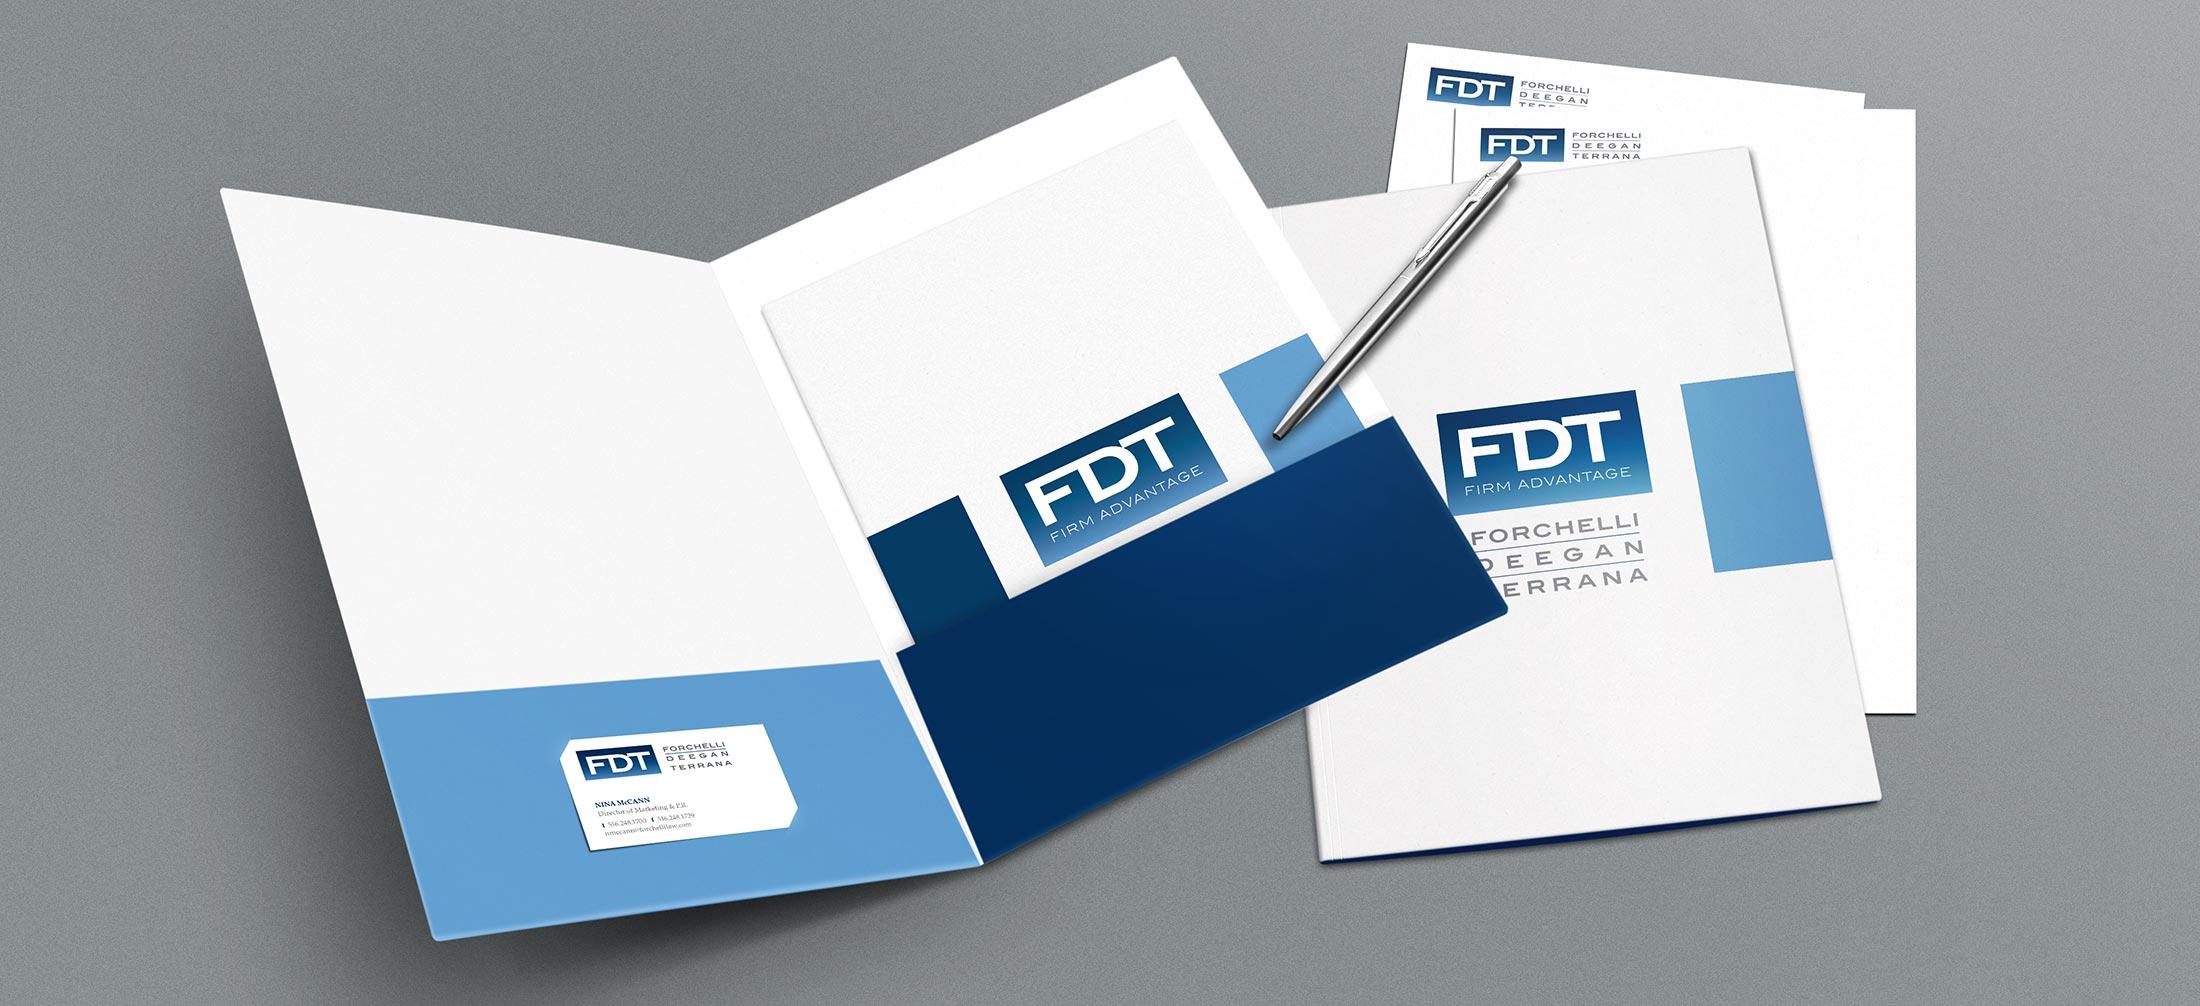 FDT_1920x714_Case_Study_Full_Width_Branding